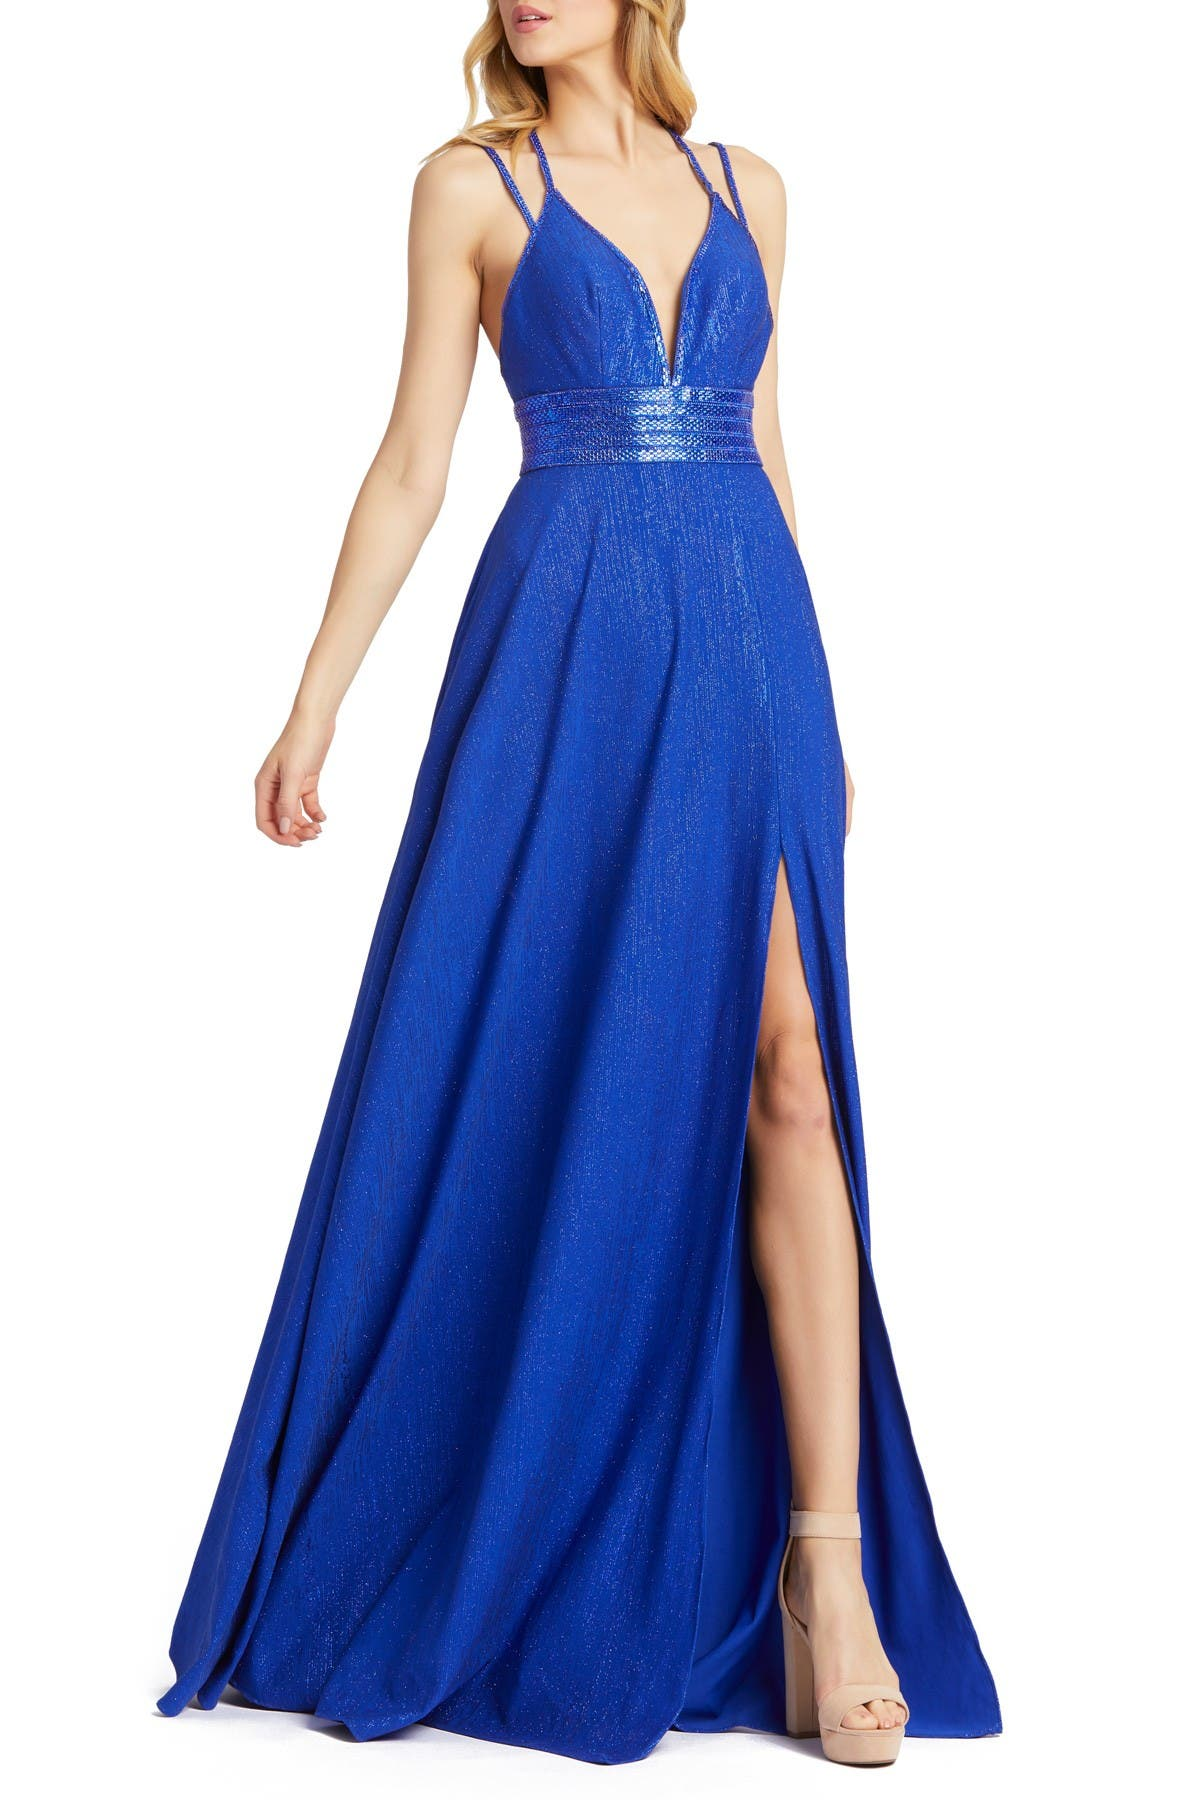 Image of Mac Duggal Double Strap Sparkle A-Line Dress